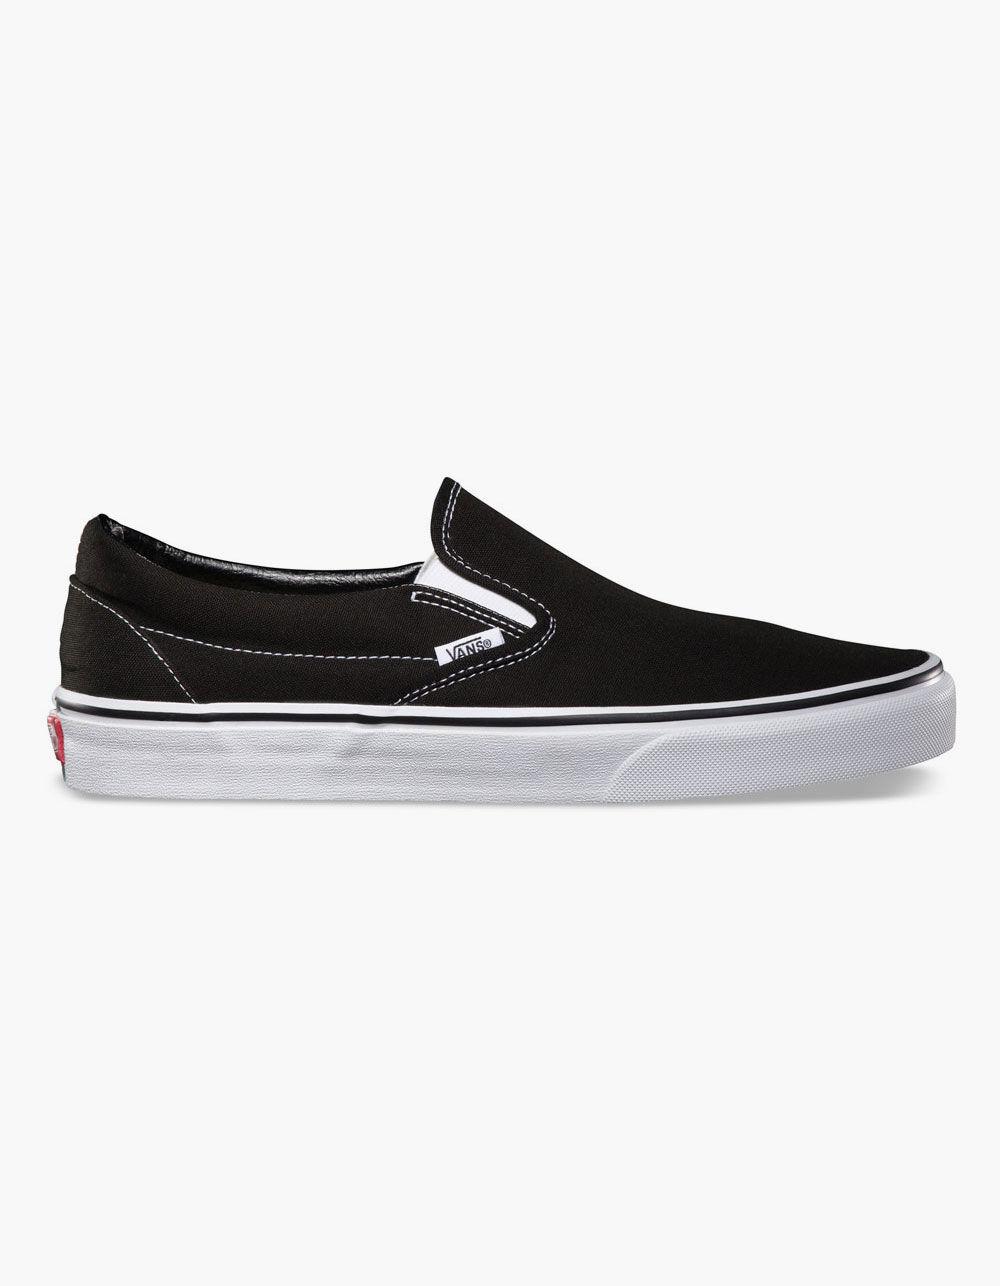 VANS CLASSIC SLIP-ON BLACK SHOES